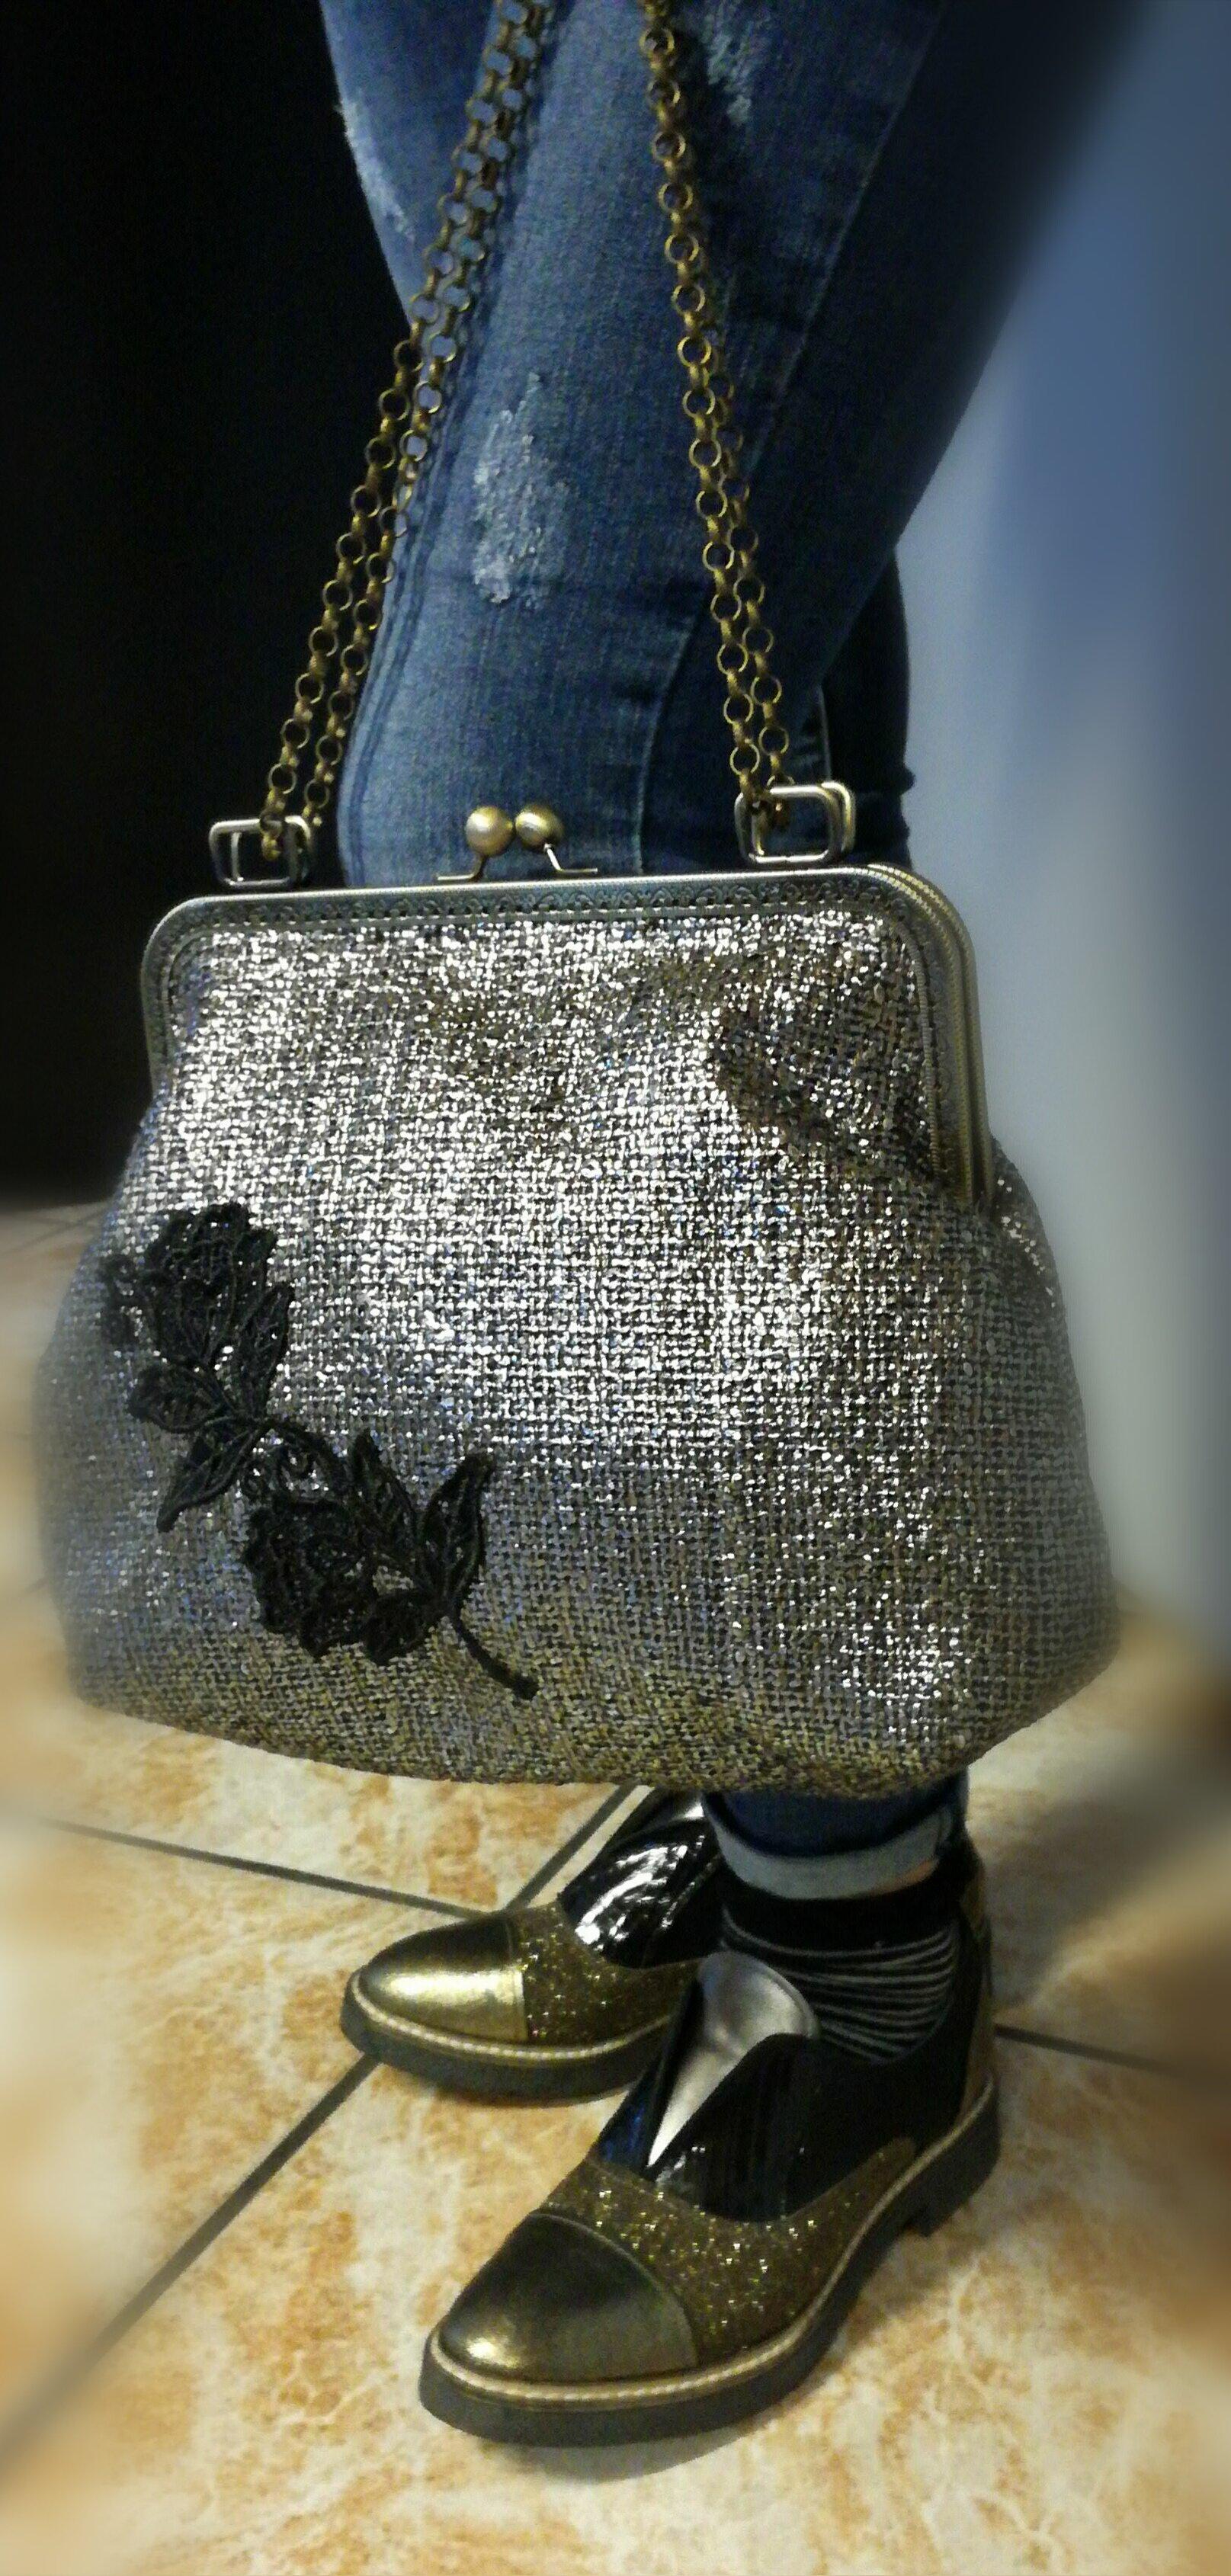 borsa argentata con fiori neri ricamati